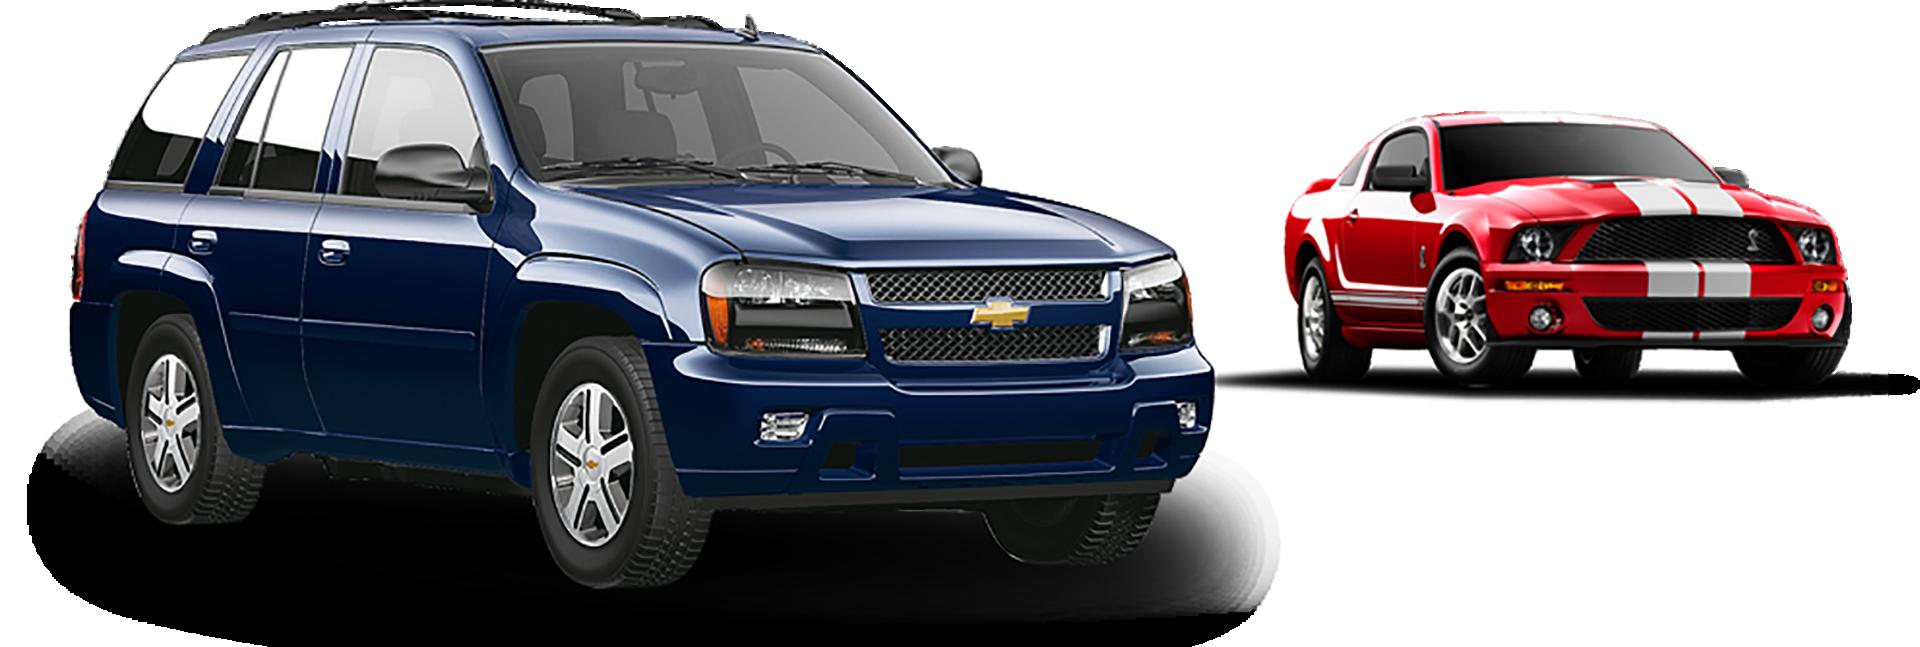 Used Cars In Nj >> Joe Dicioccio S Used Cars Car Dealer In Burlington Nj